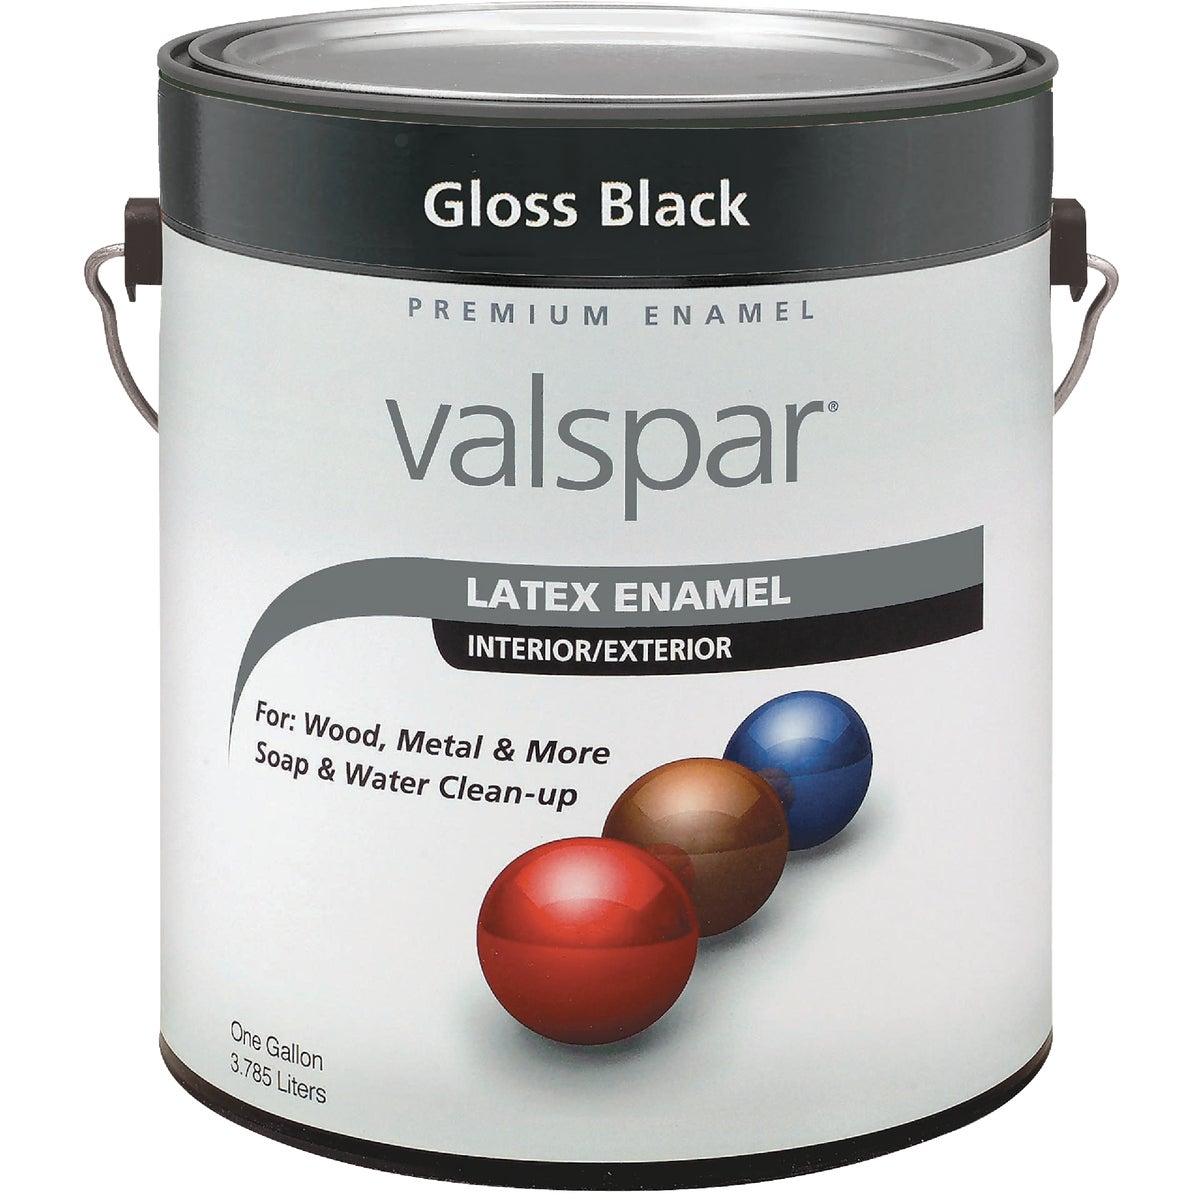 LTX GLOSS BLACK ENAMEL